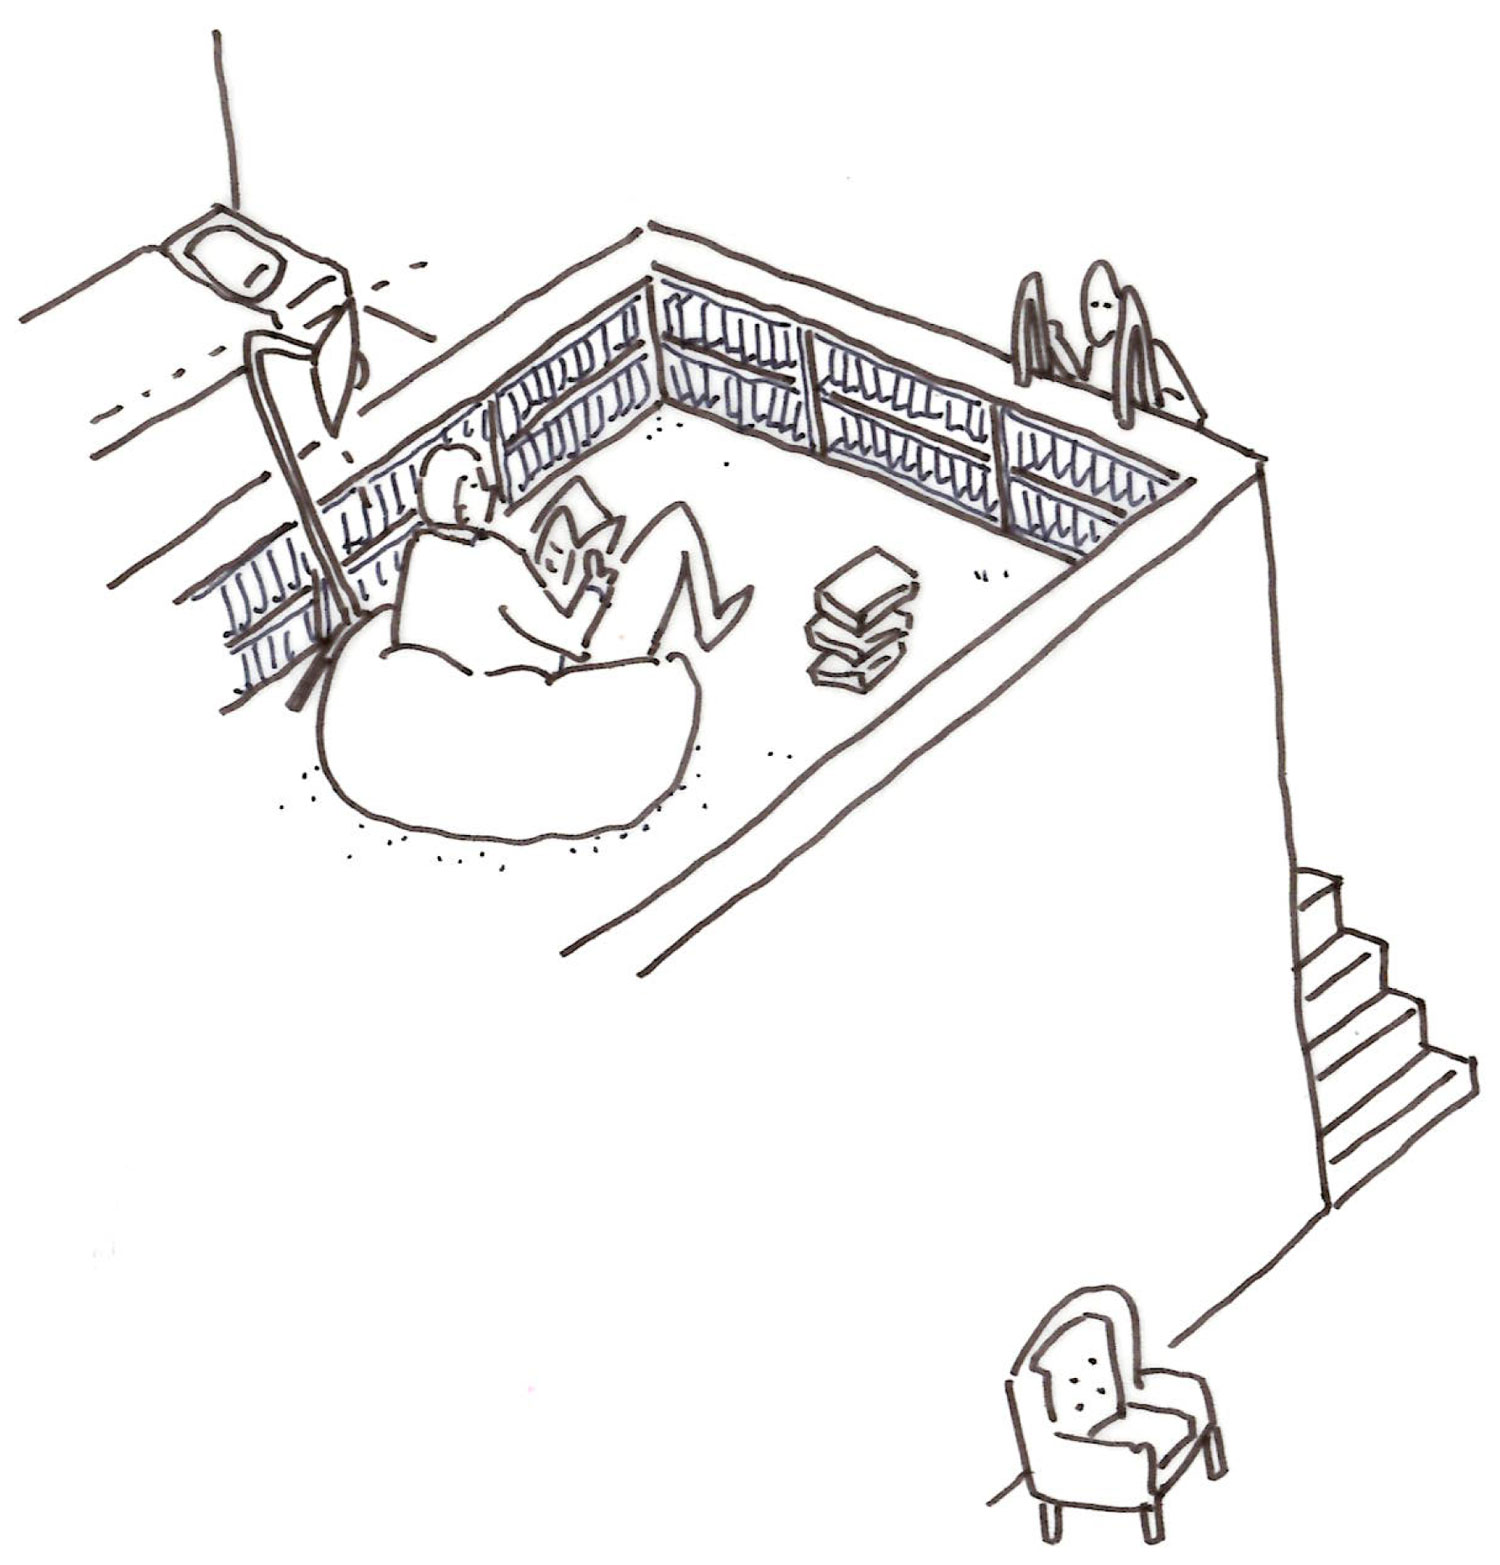 Architecture-London-Design-Freehaus-Water-Tower-Sketch-5.jpg